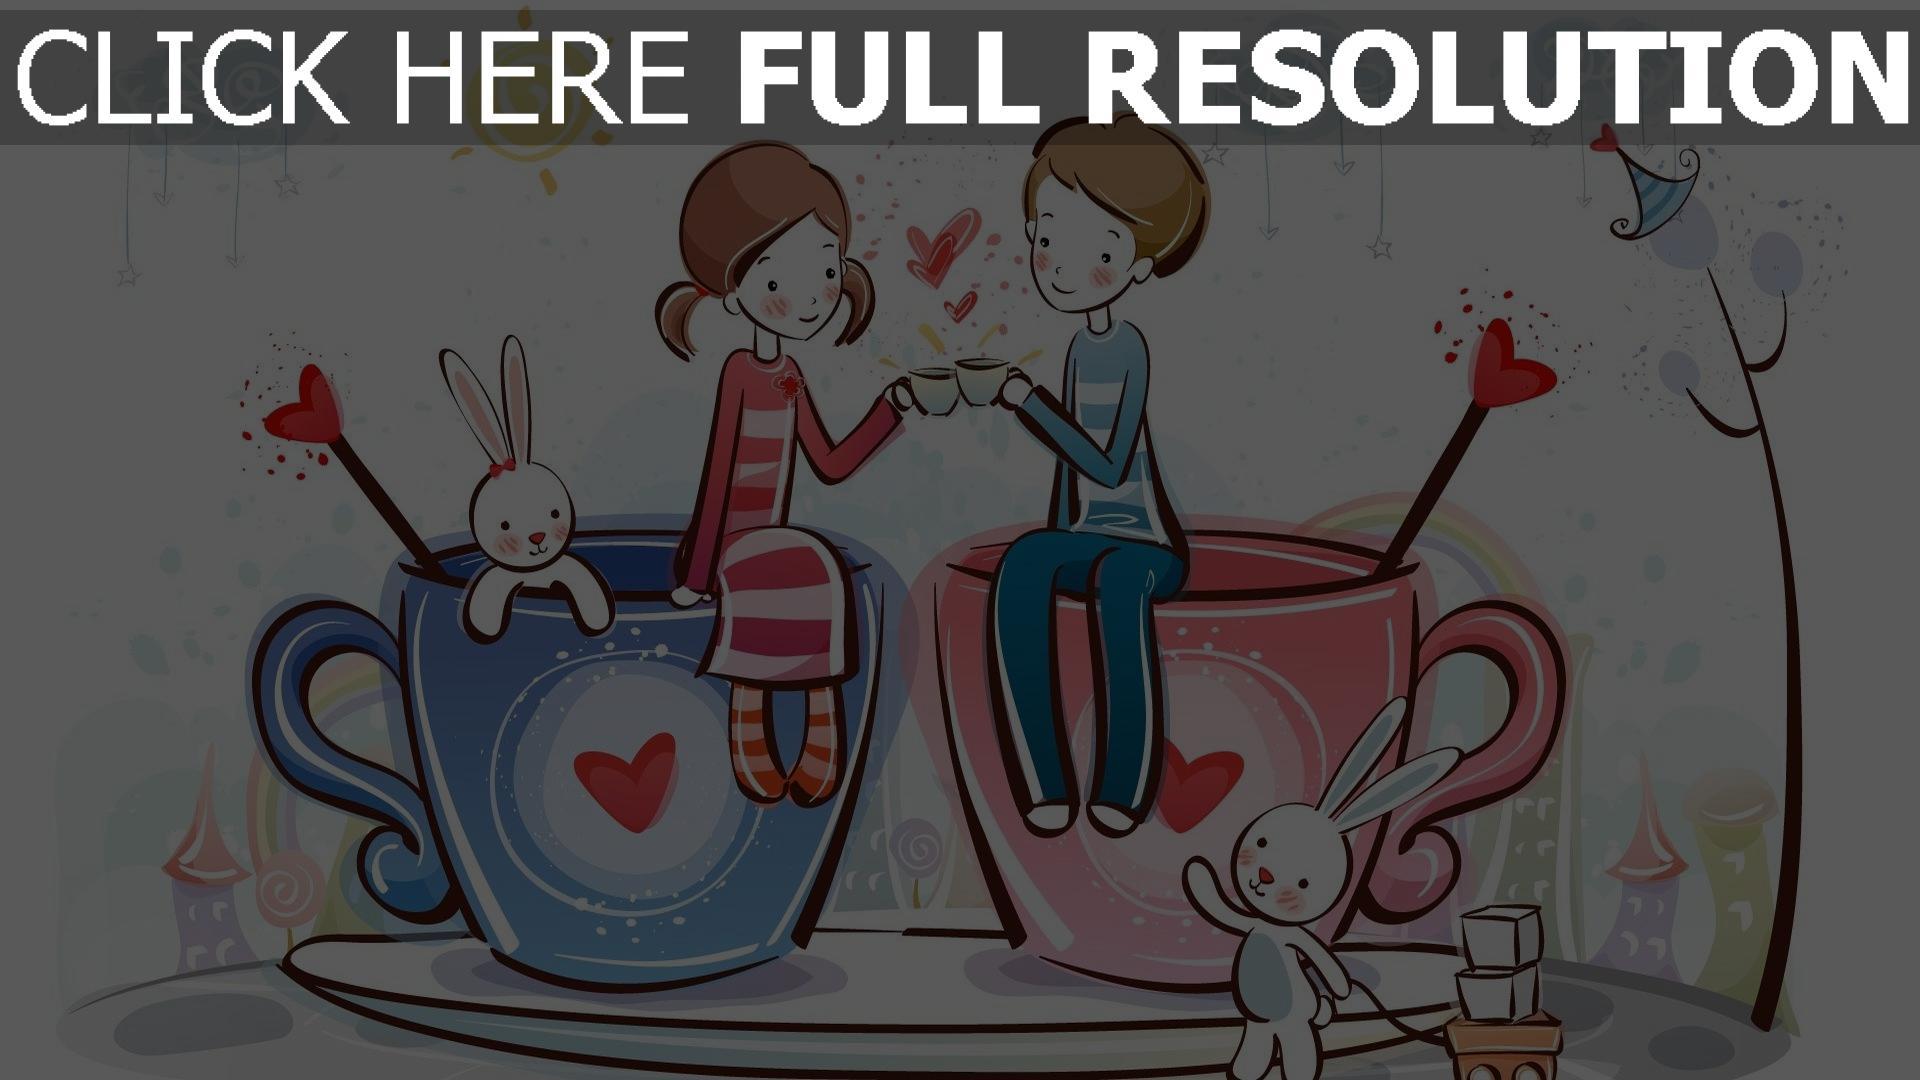 Hd Hintergrundbilder Valentinstag Paar Kaffee Romantik Desktop